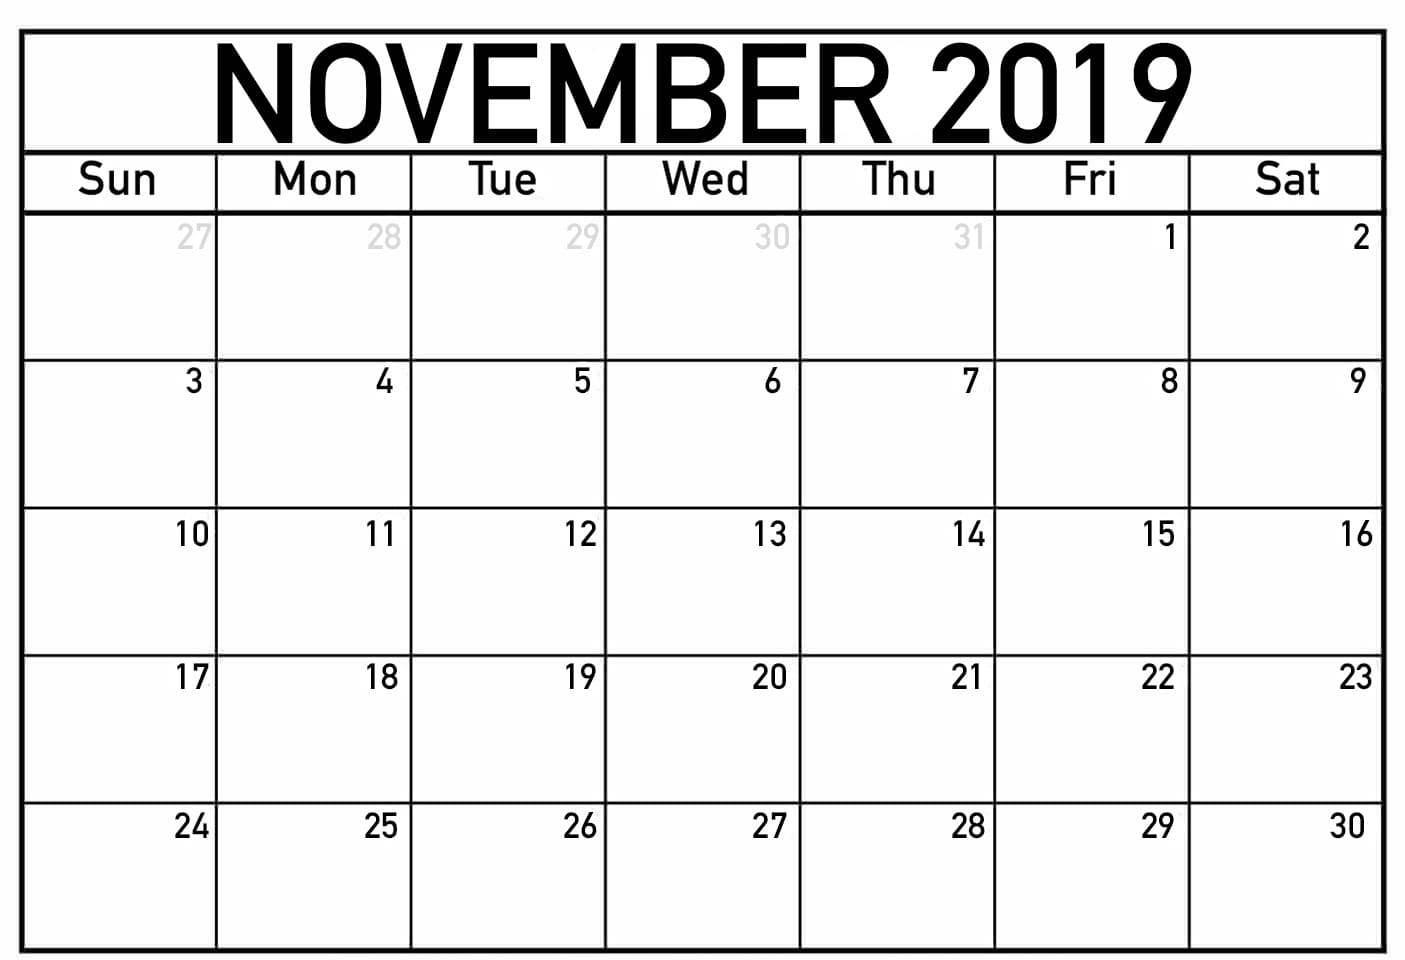 Fillable Calendar for November 2019 Printable